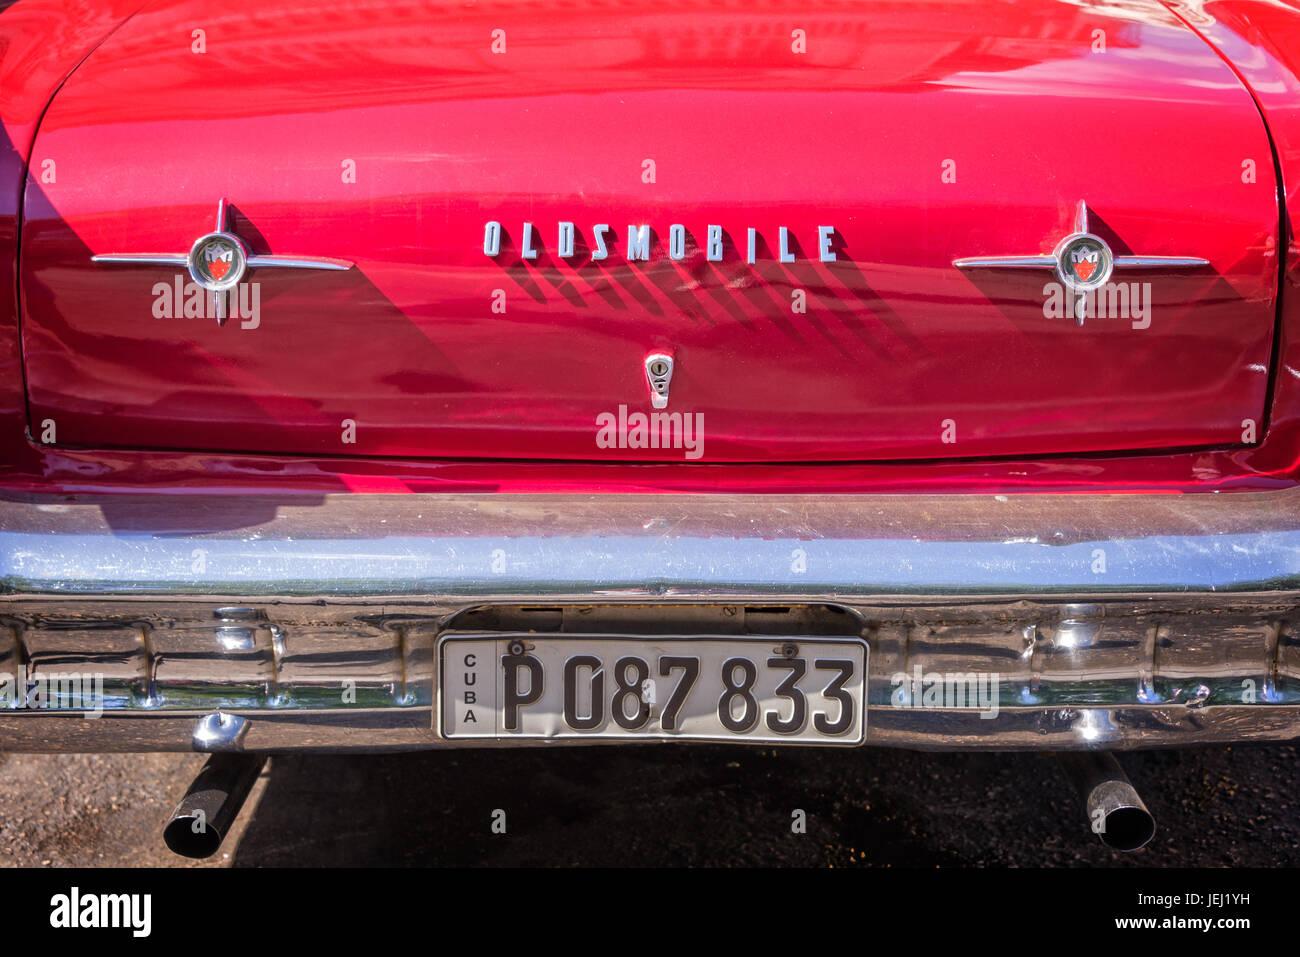 Havanna, Kuba - APRIL 18: Detail eines roten amerikanischen Oldsmobile Oldtimers, am 18. April 2016 in Havanna Stockbild